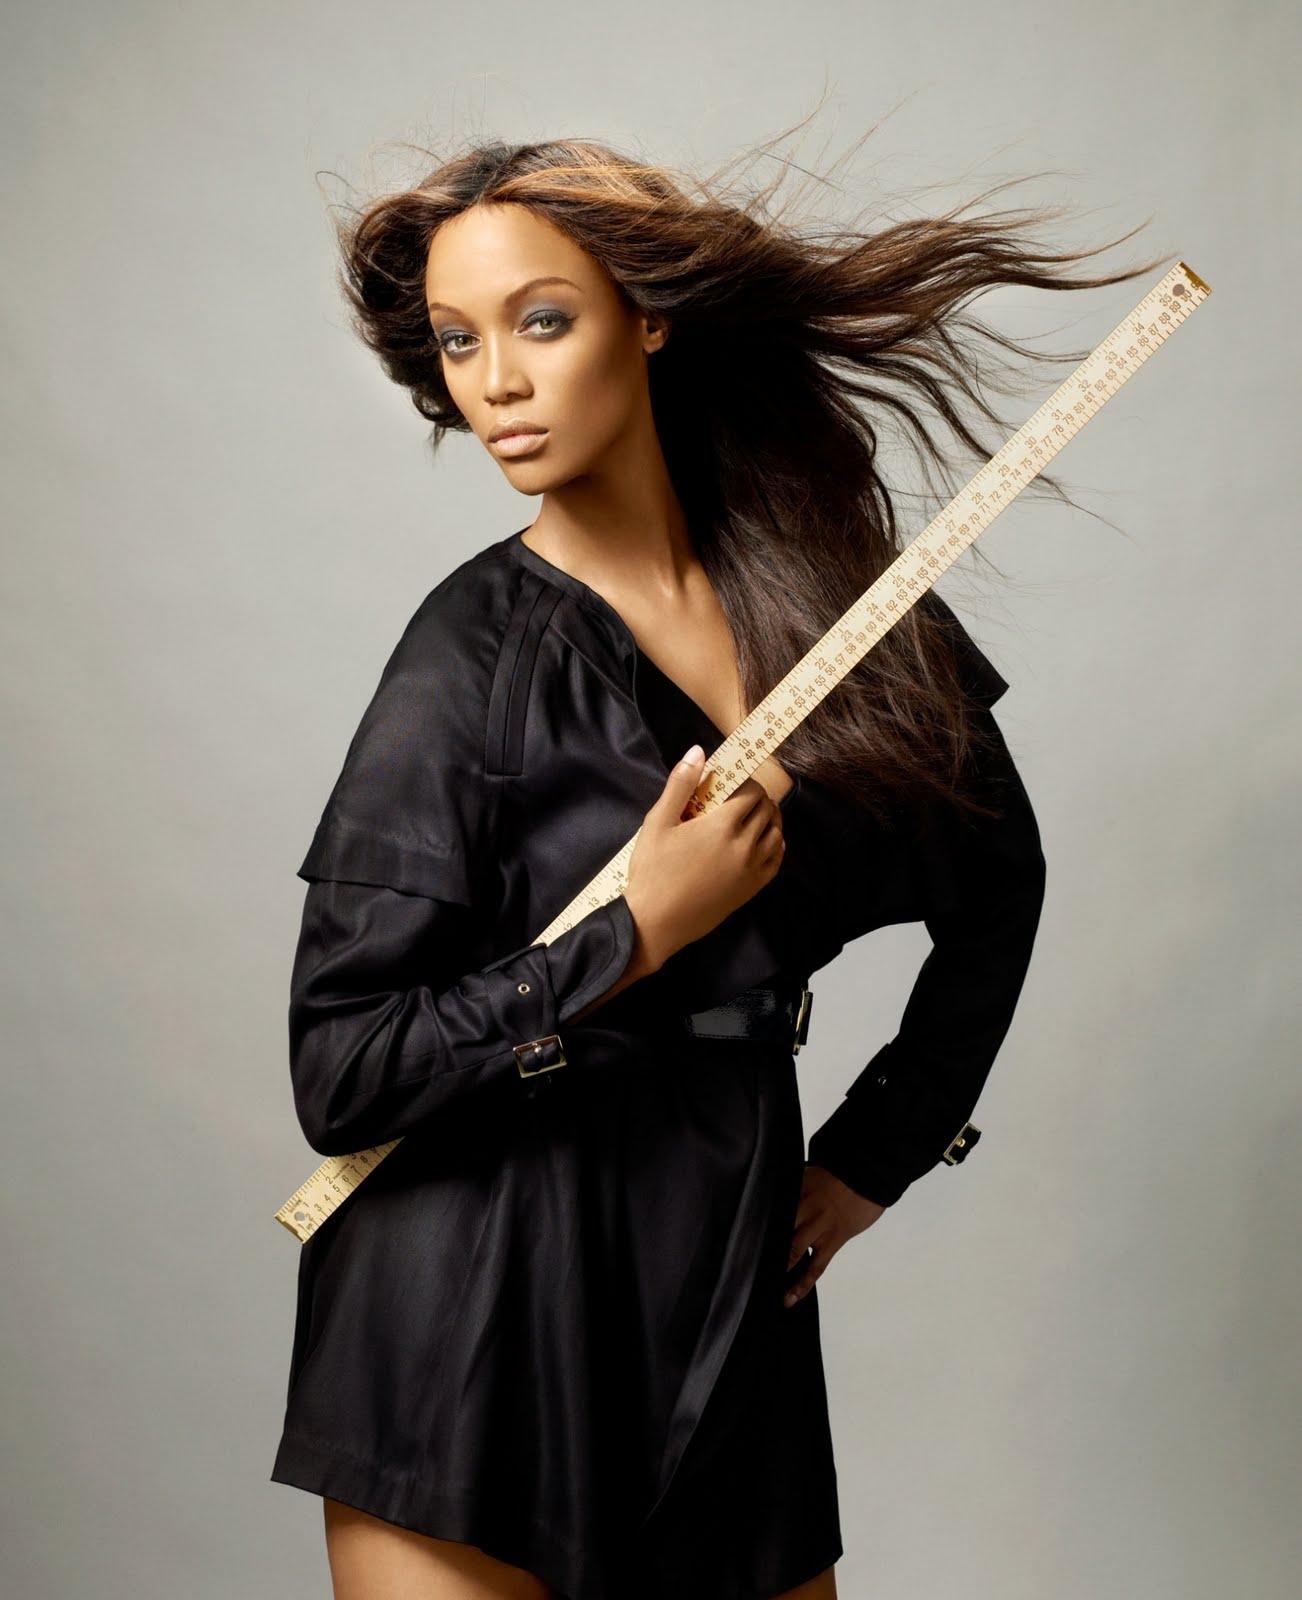 Tyra Banks Antm: Models Inspiration: Tyra Banks (America's Next Top Model